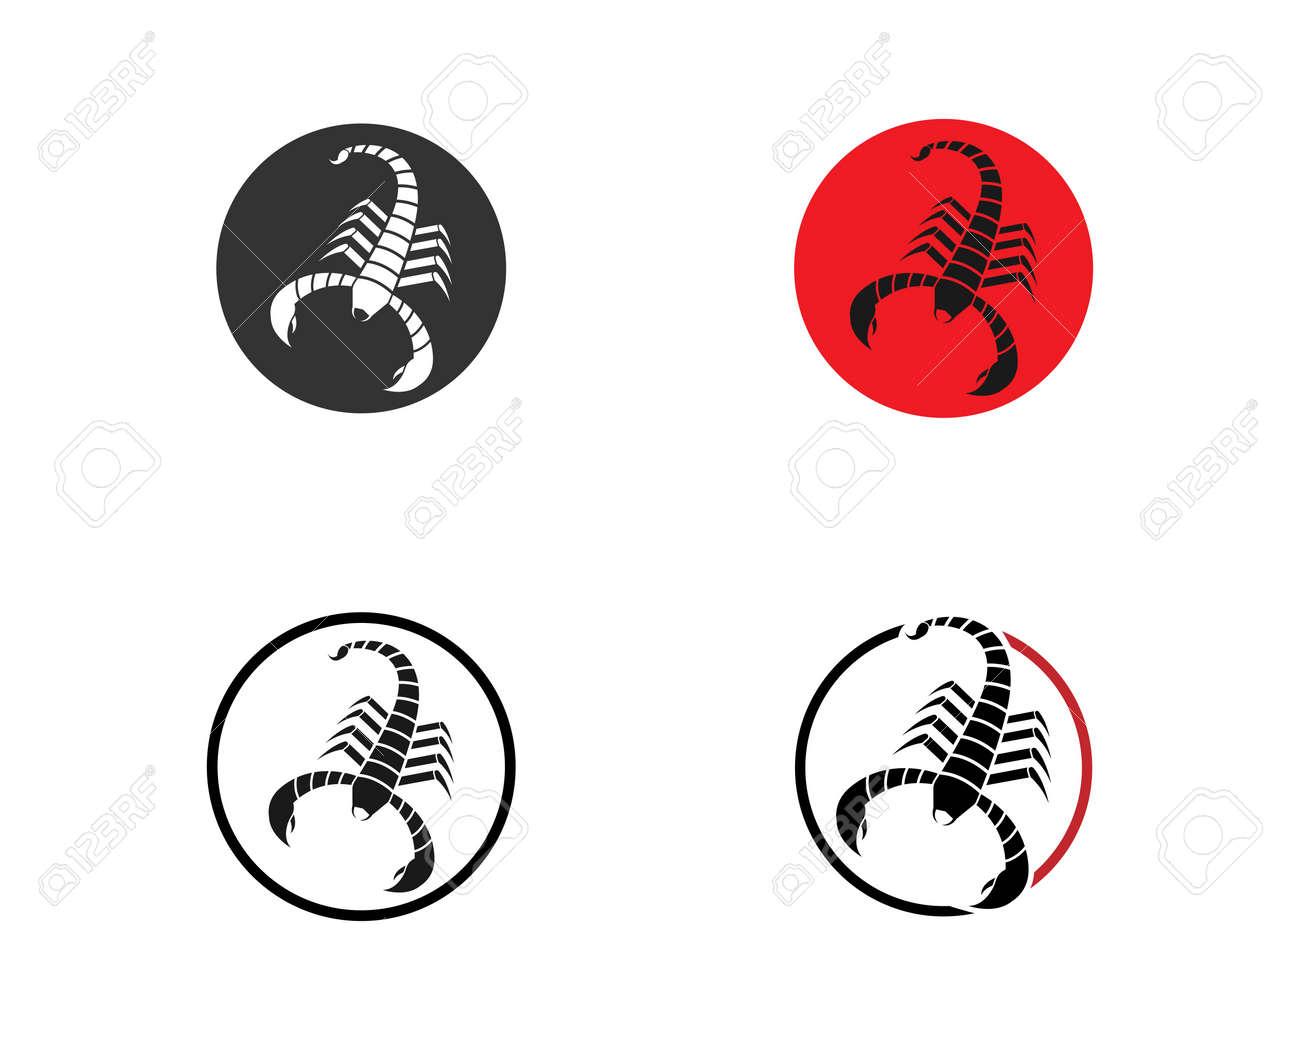 Scorpion icon Template Vector illustration - 152037696